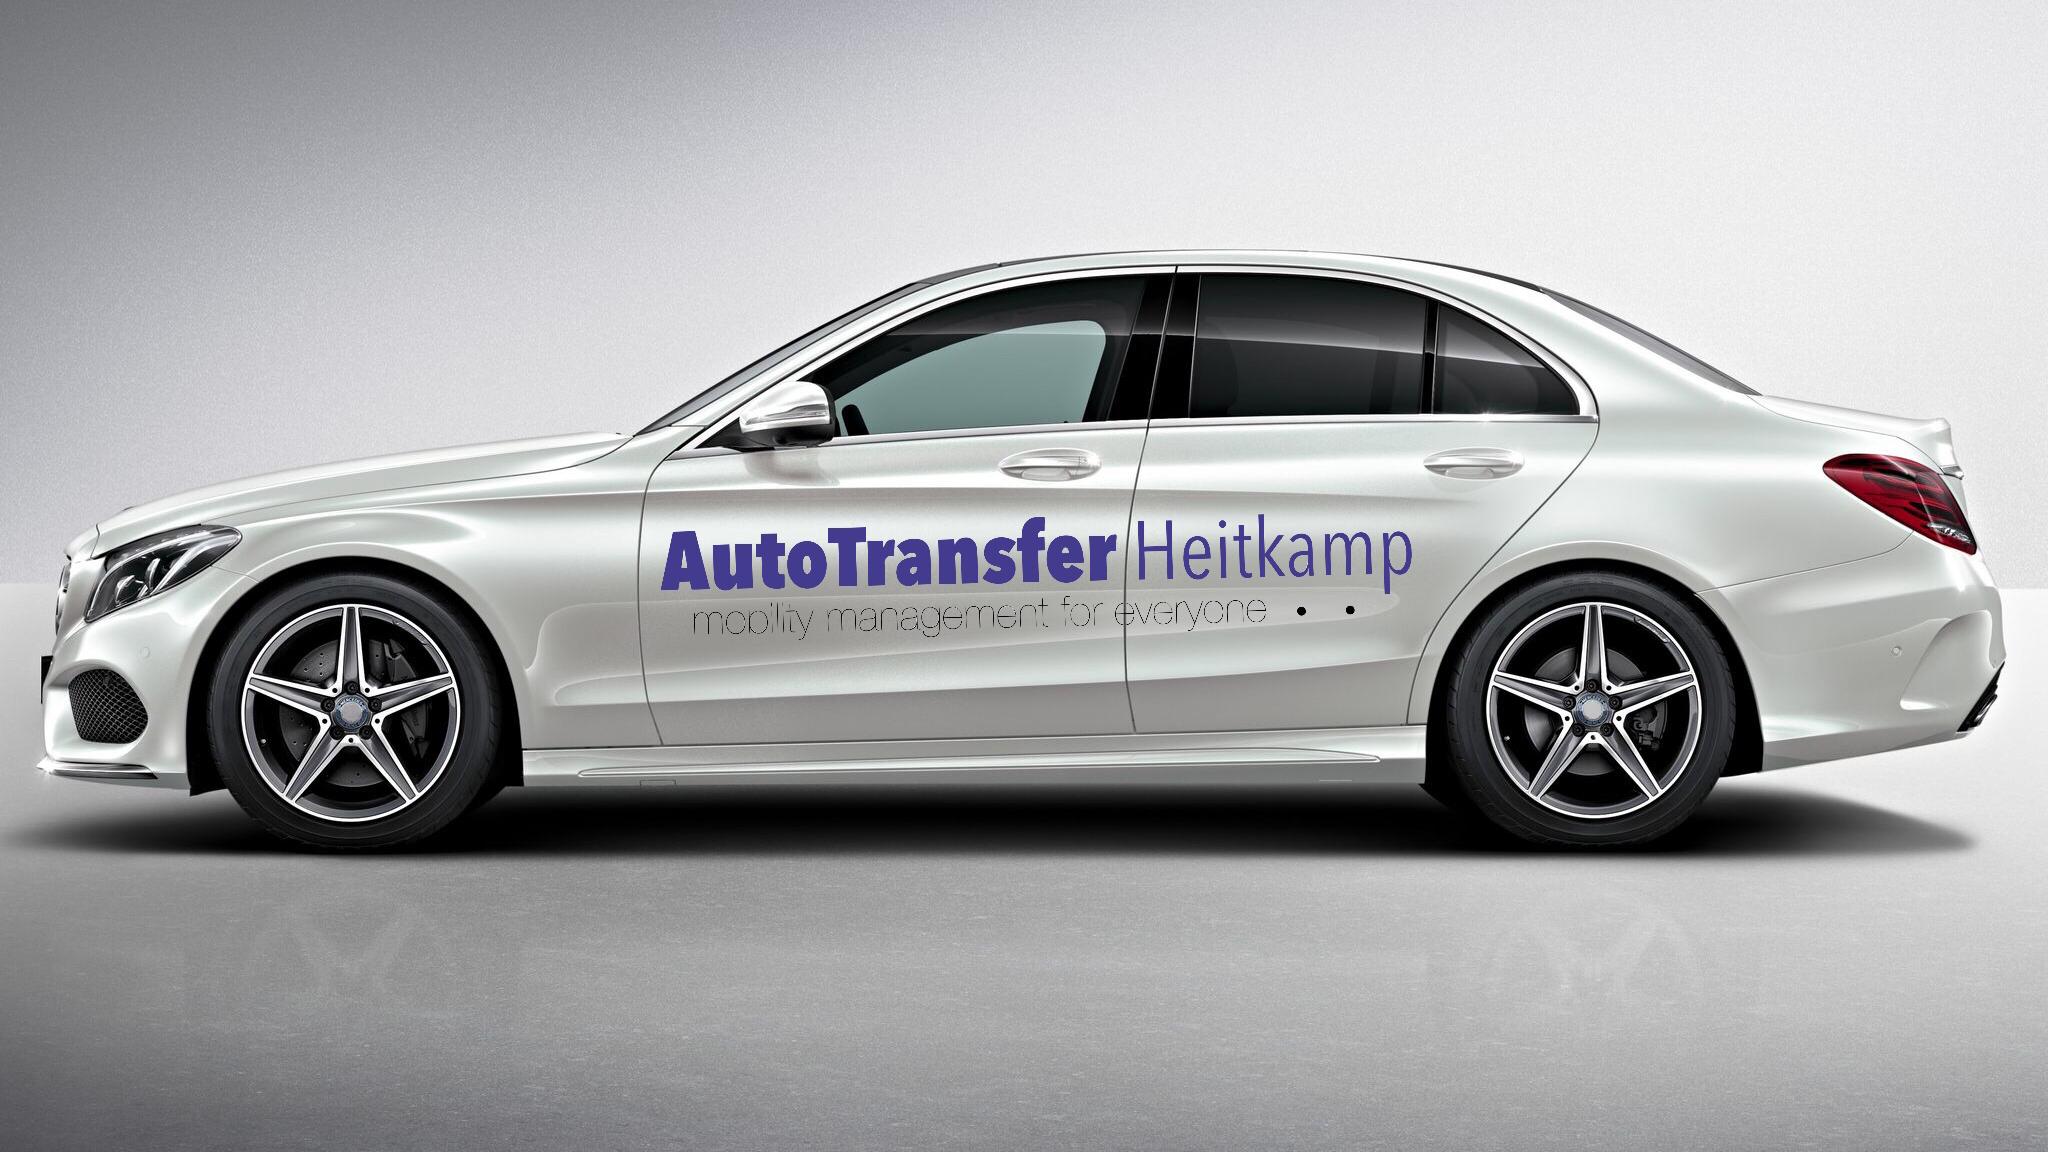 AutoTransfer Heitkamp